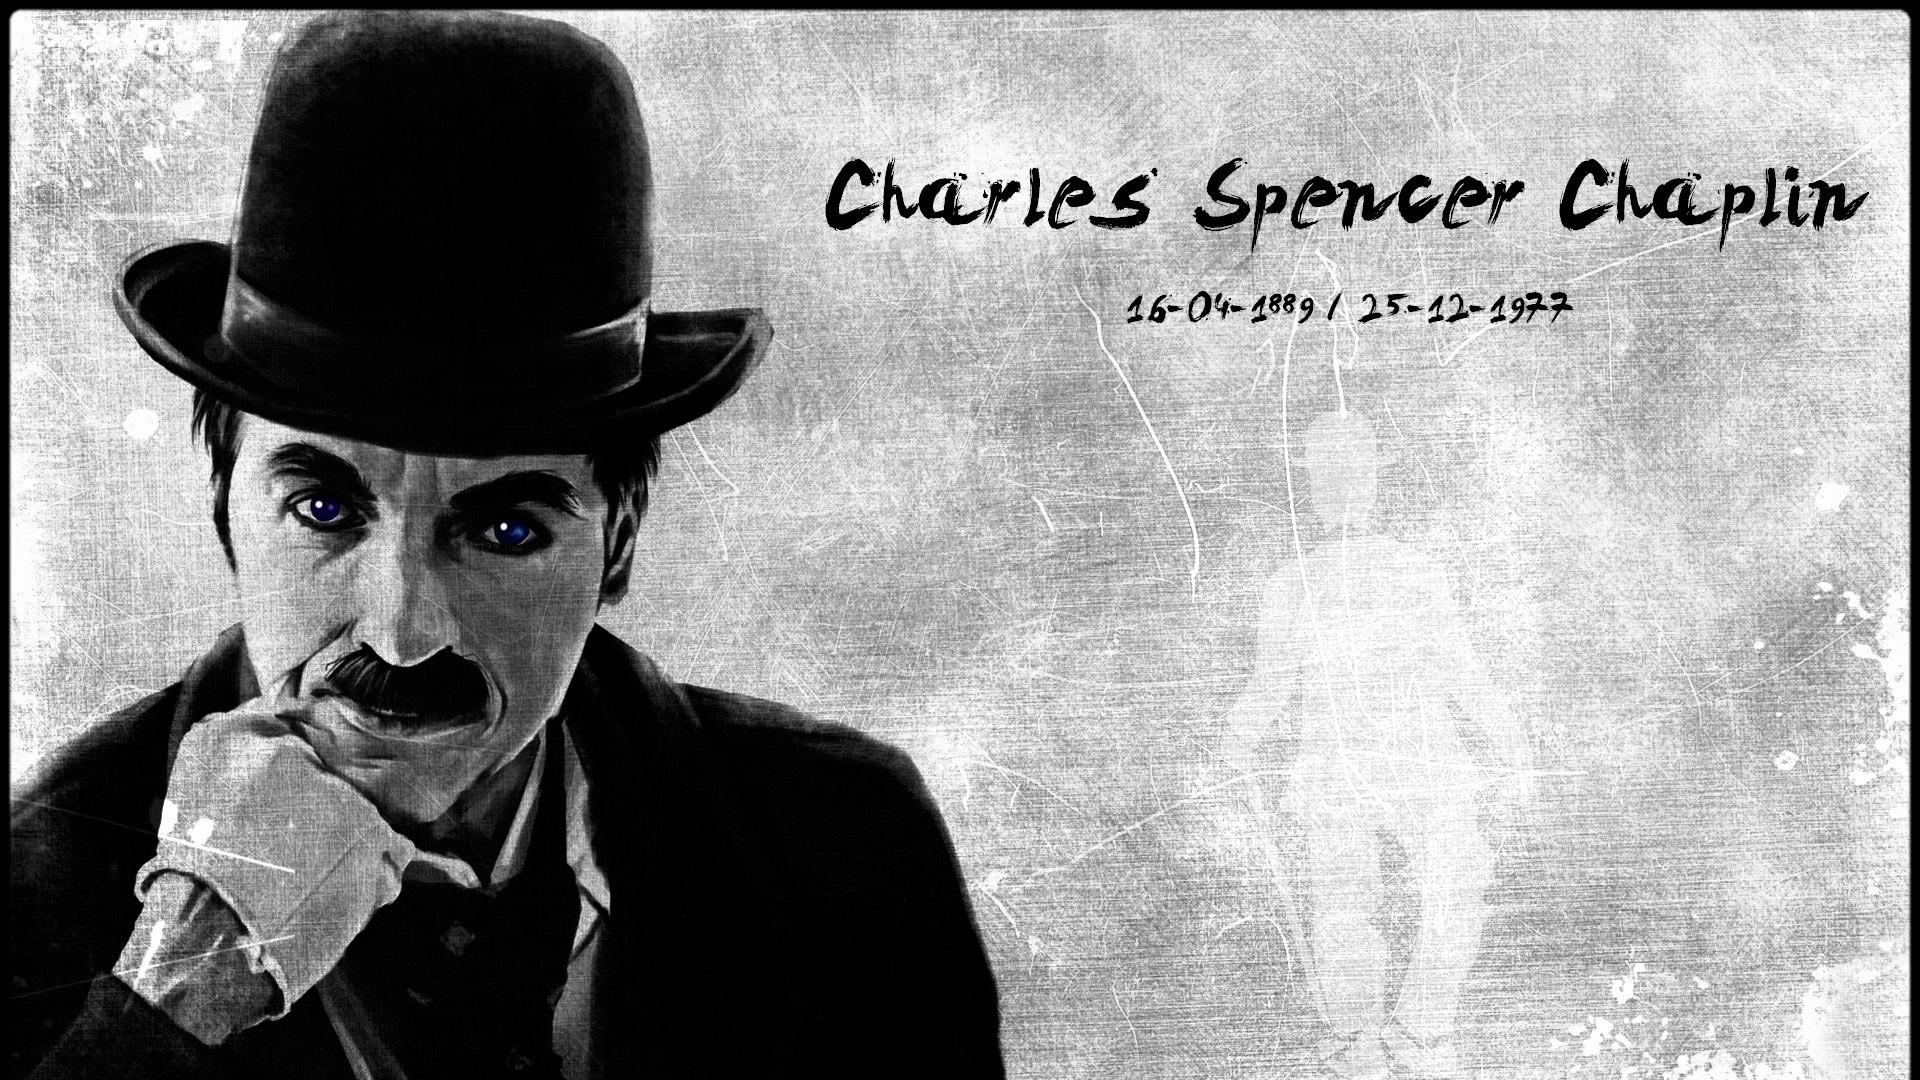 charles chaplin hd wallpapers 7wallpapers net charles chaplin hd wallpapers